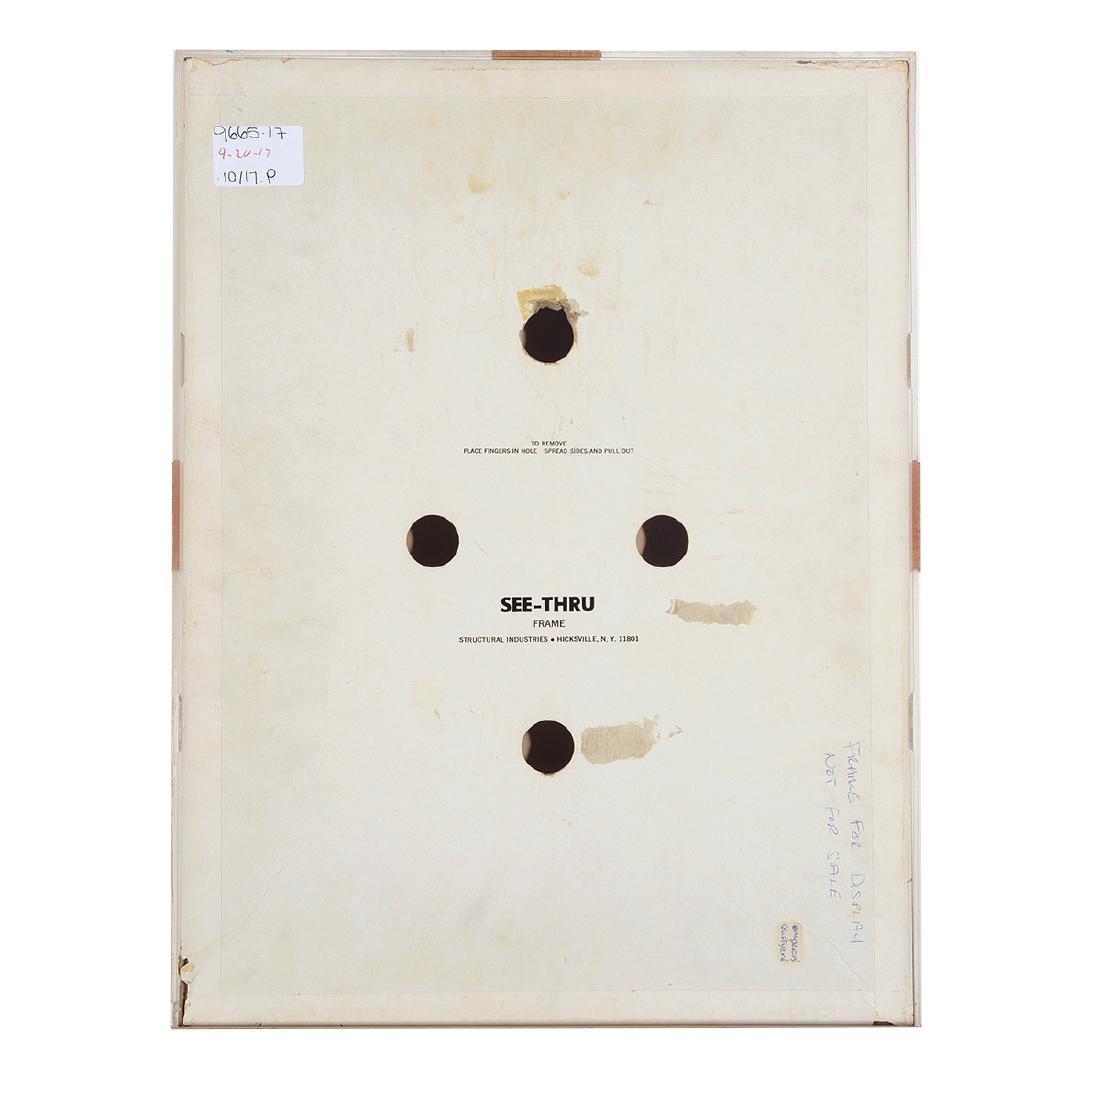 Erte print from the 1930's Harpers Bazaar magazine - 5